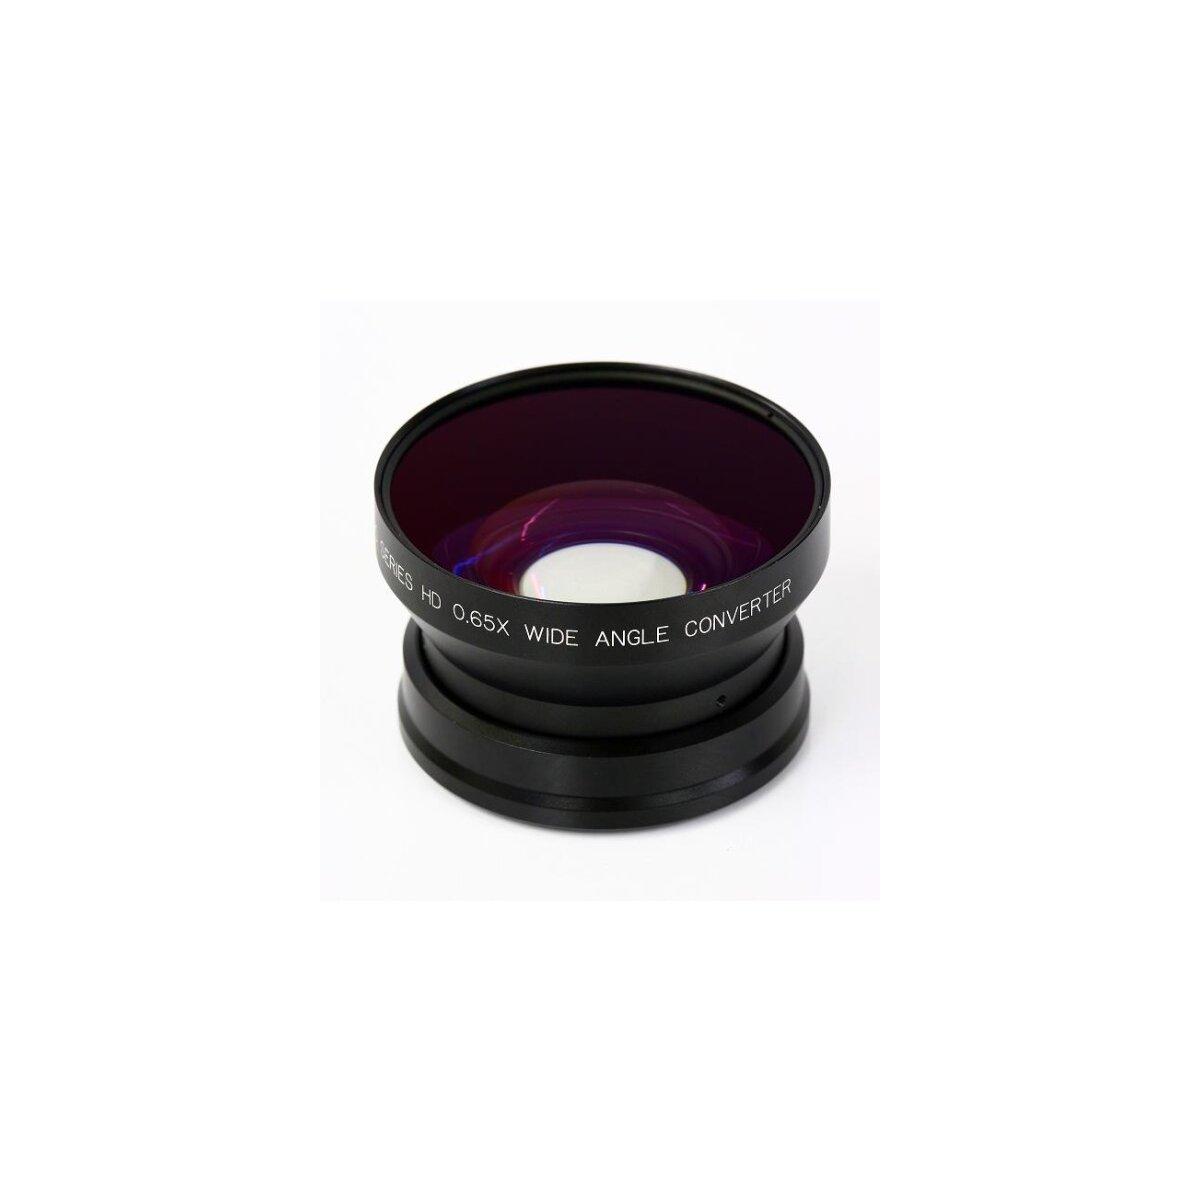 0.65x Weitwinkel Adapter kompatibel mit Sony DCR-VX2100, DCR-VX2000, DSR-PD150, DSR-PD170, DSR-250, DSR-200, DSR-220A